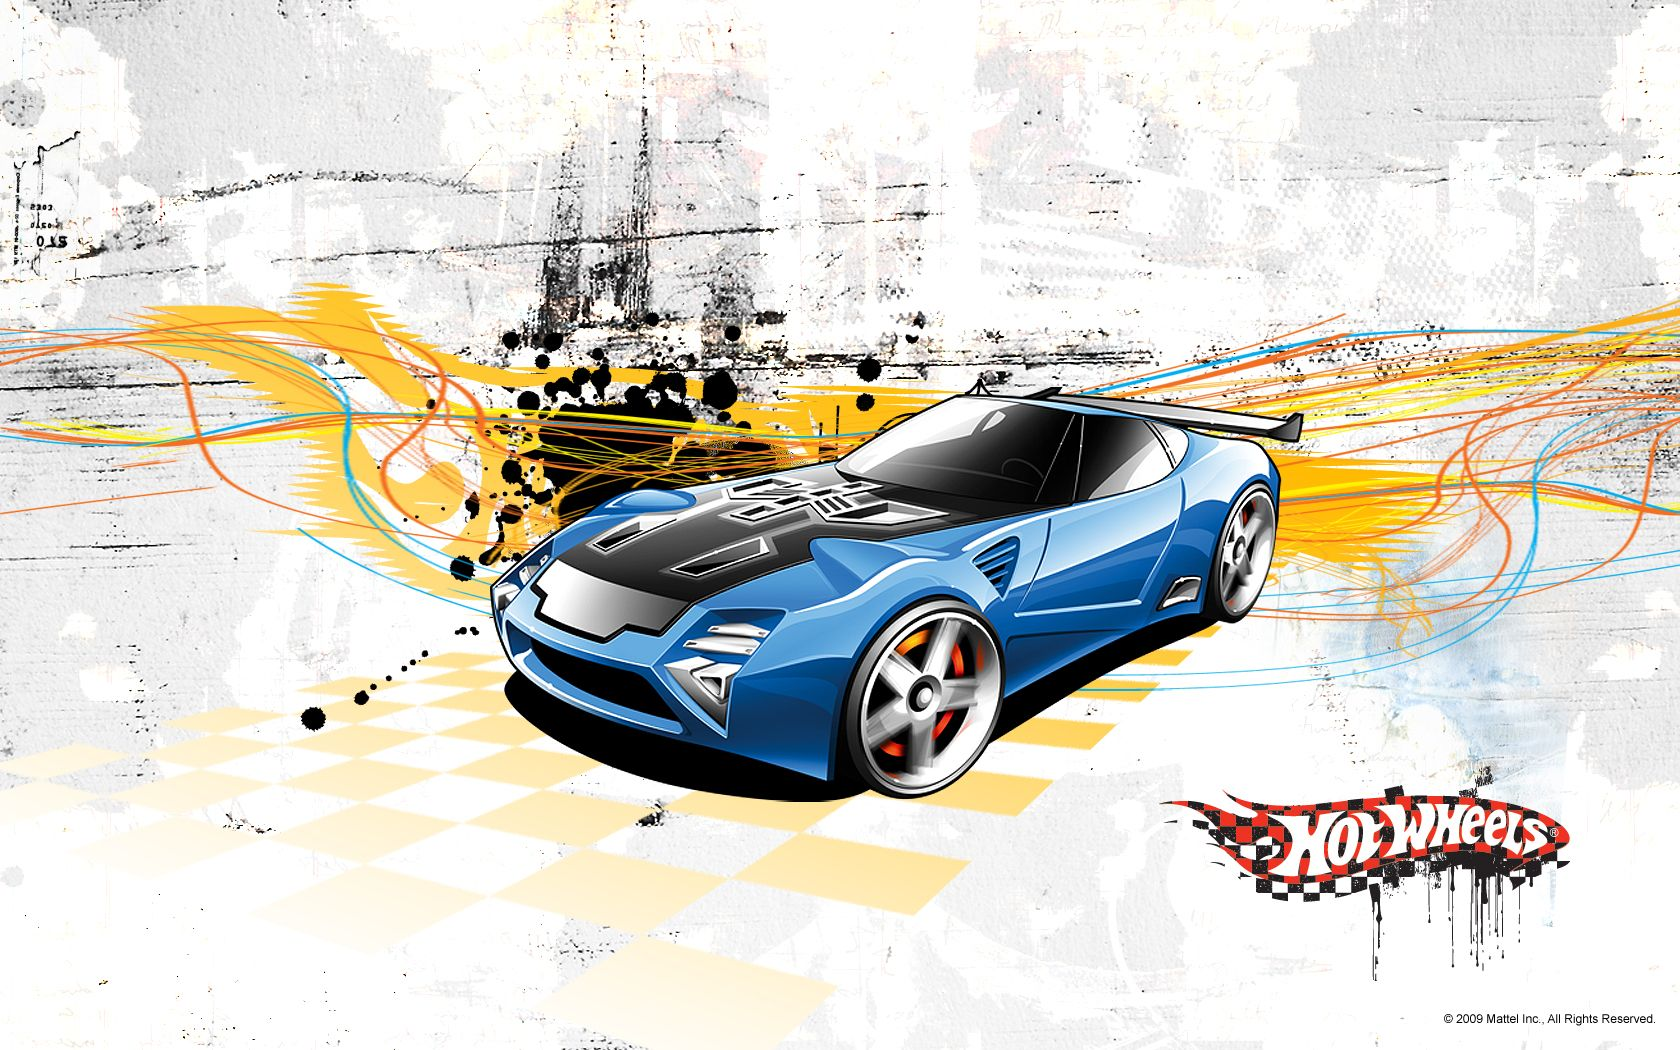 Nerve Hammer Hot Wheels Carritos Hot Wheels Cumpleanos De Hot Wheels